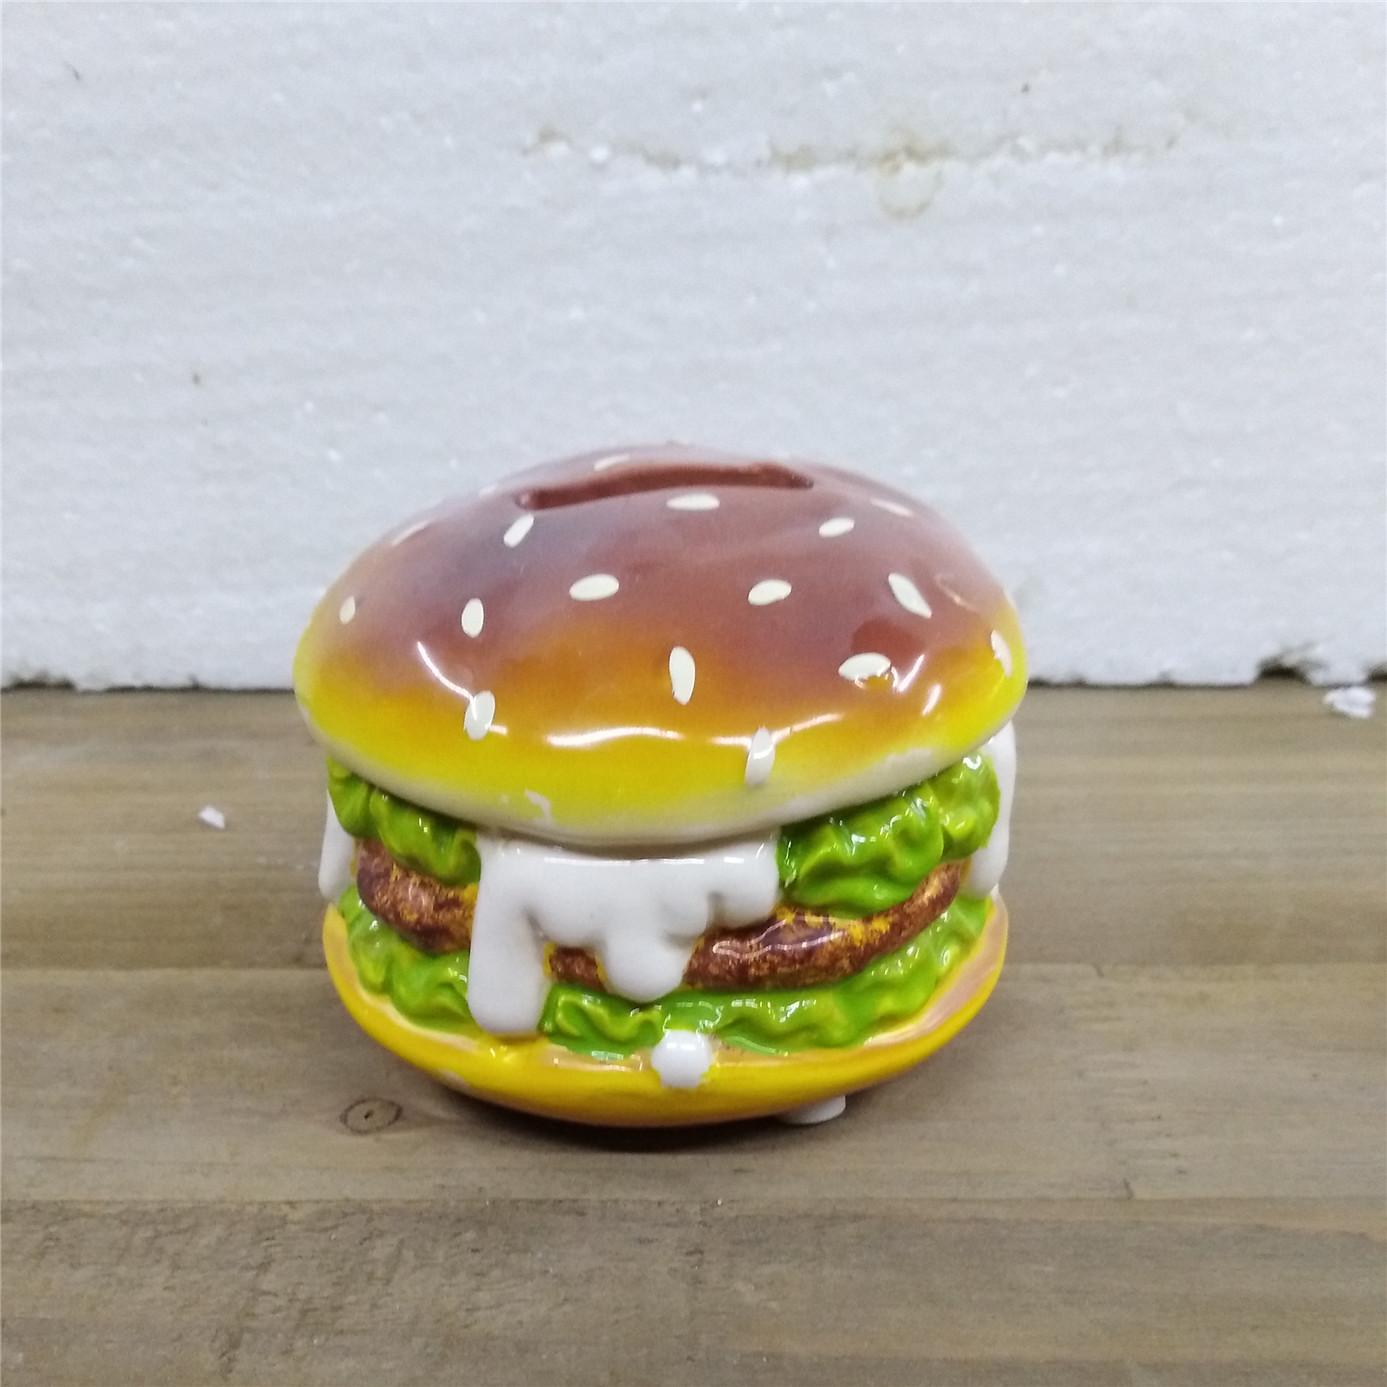 Custom  creative   ceramic beef burger  shape  money  bank,kids birthday gift money  bank